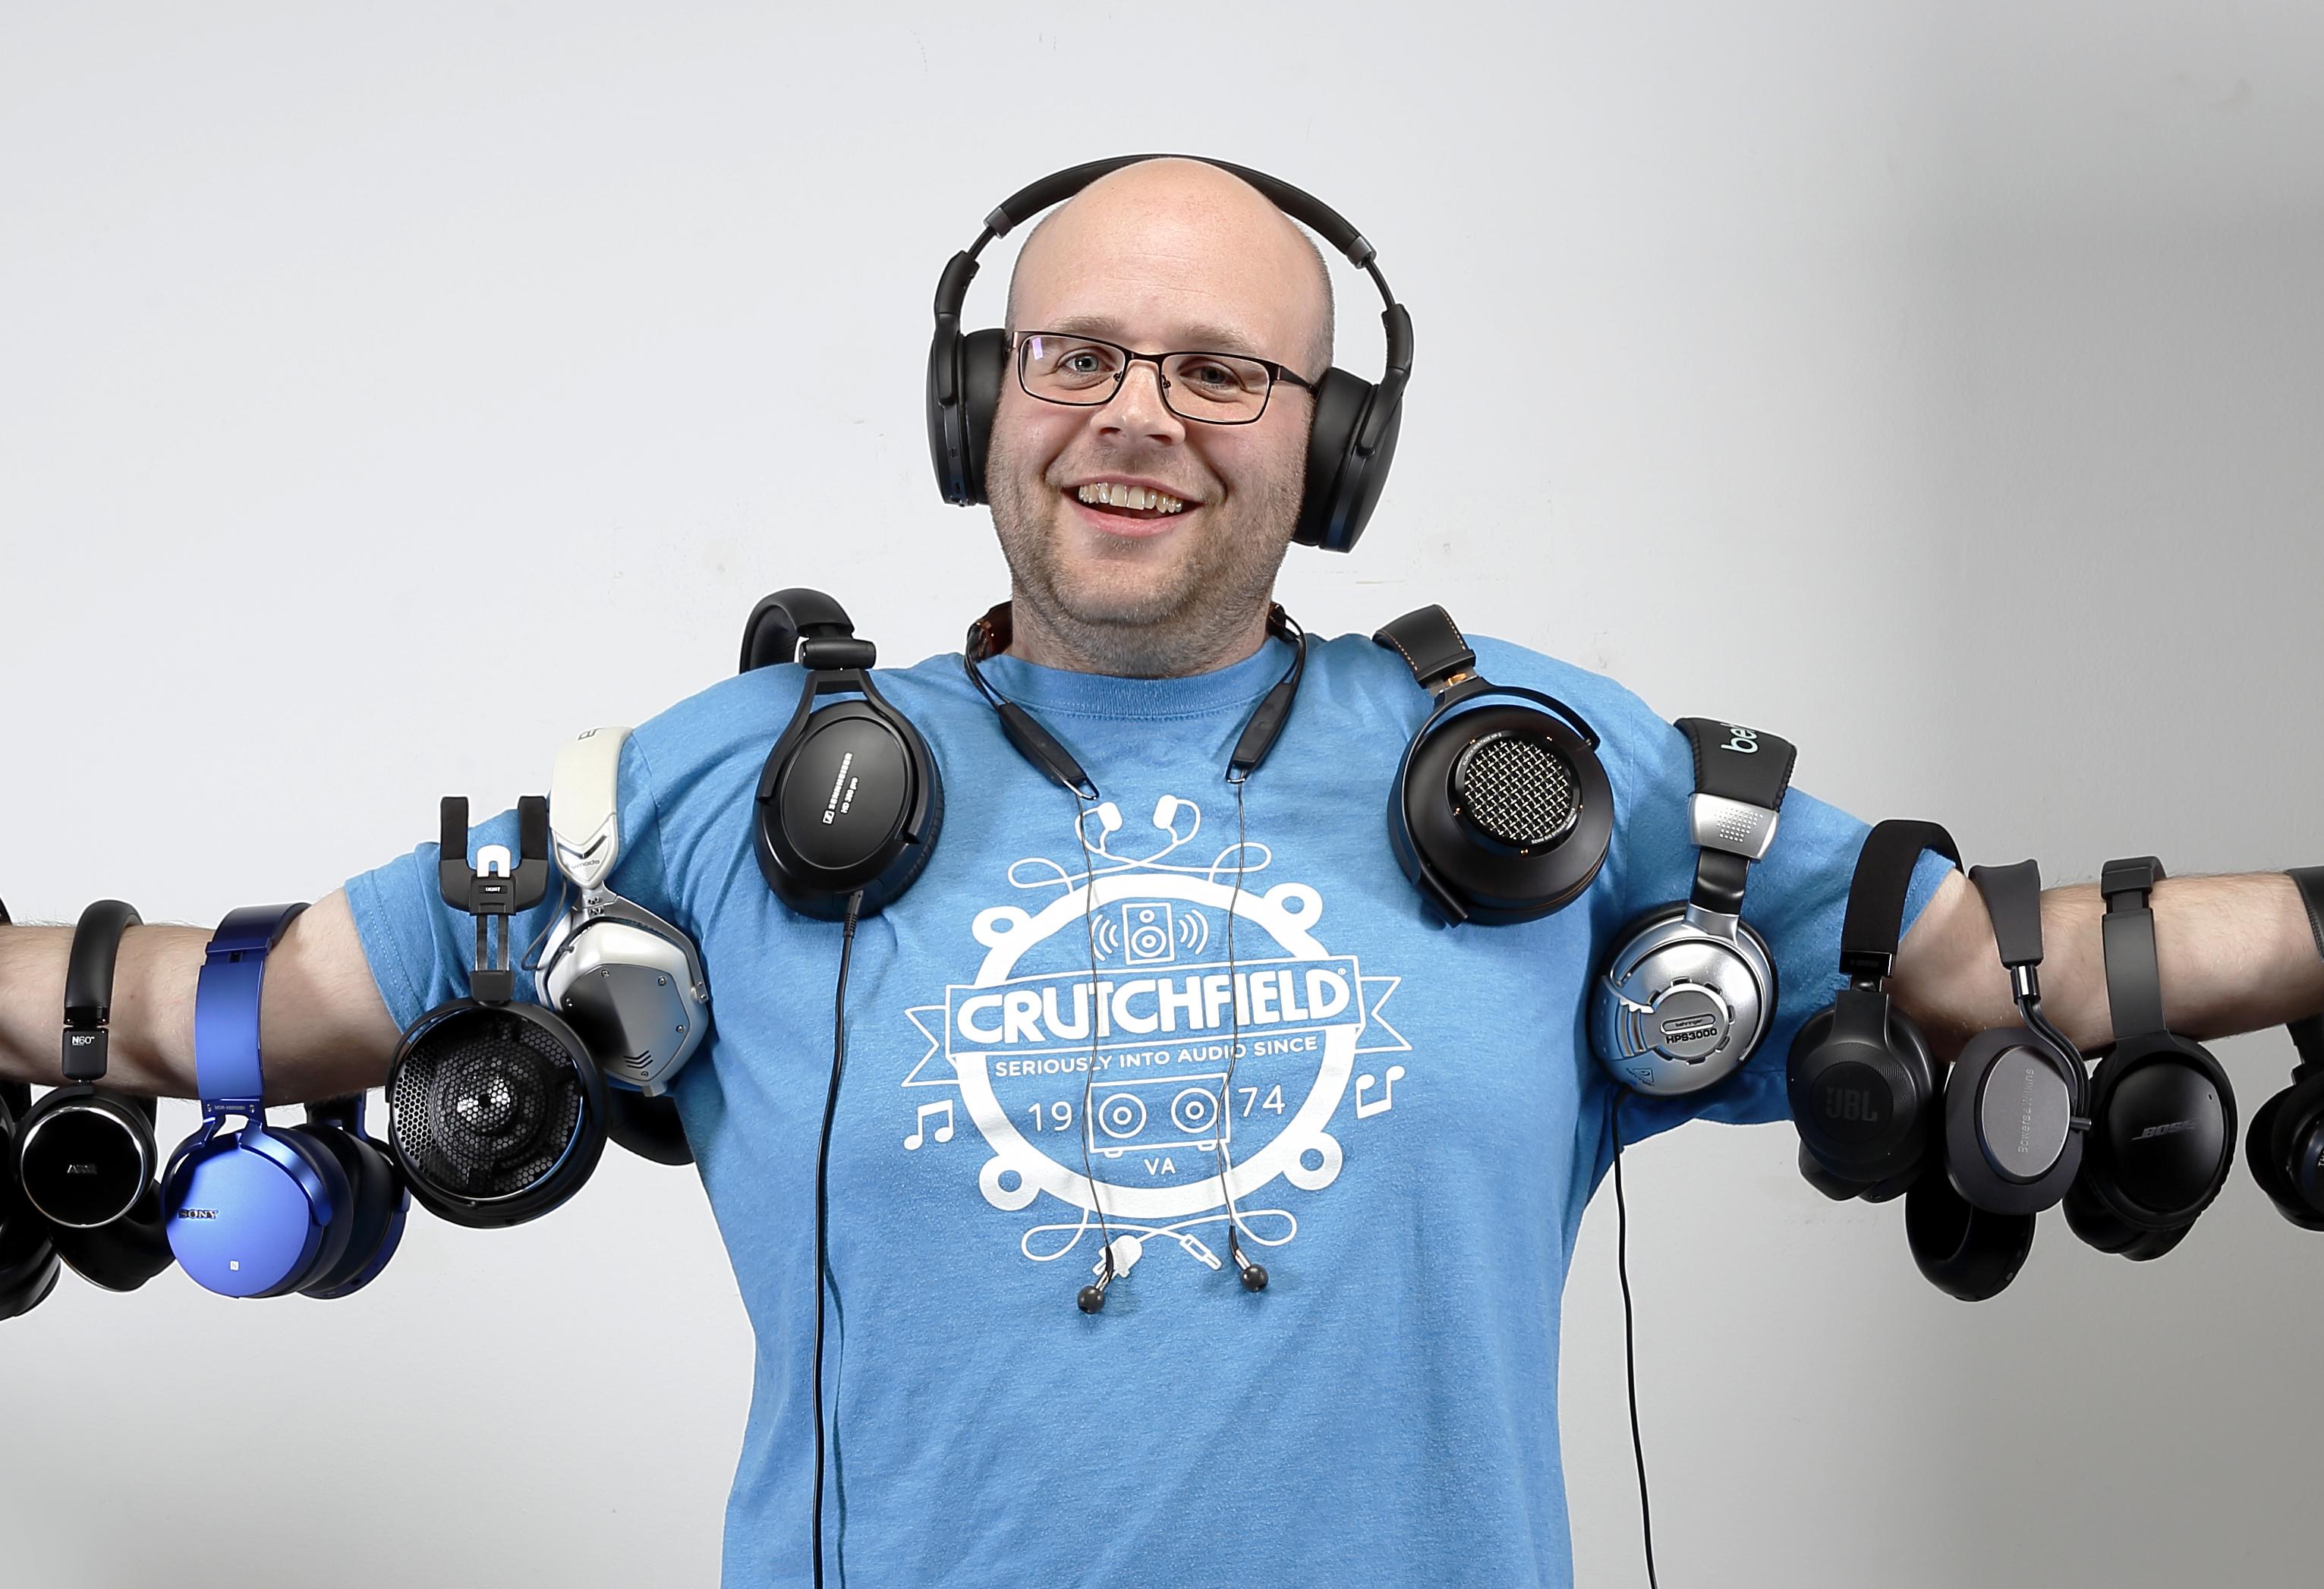 Headphones: buyer's guide 2015 by matthew hollinder (ebook) lulu.